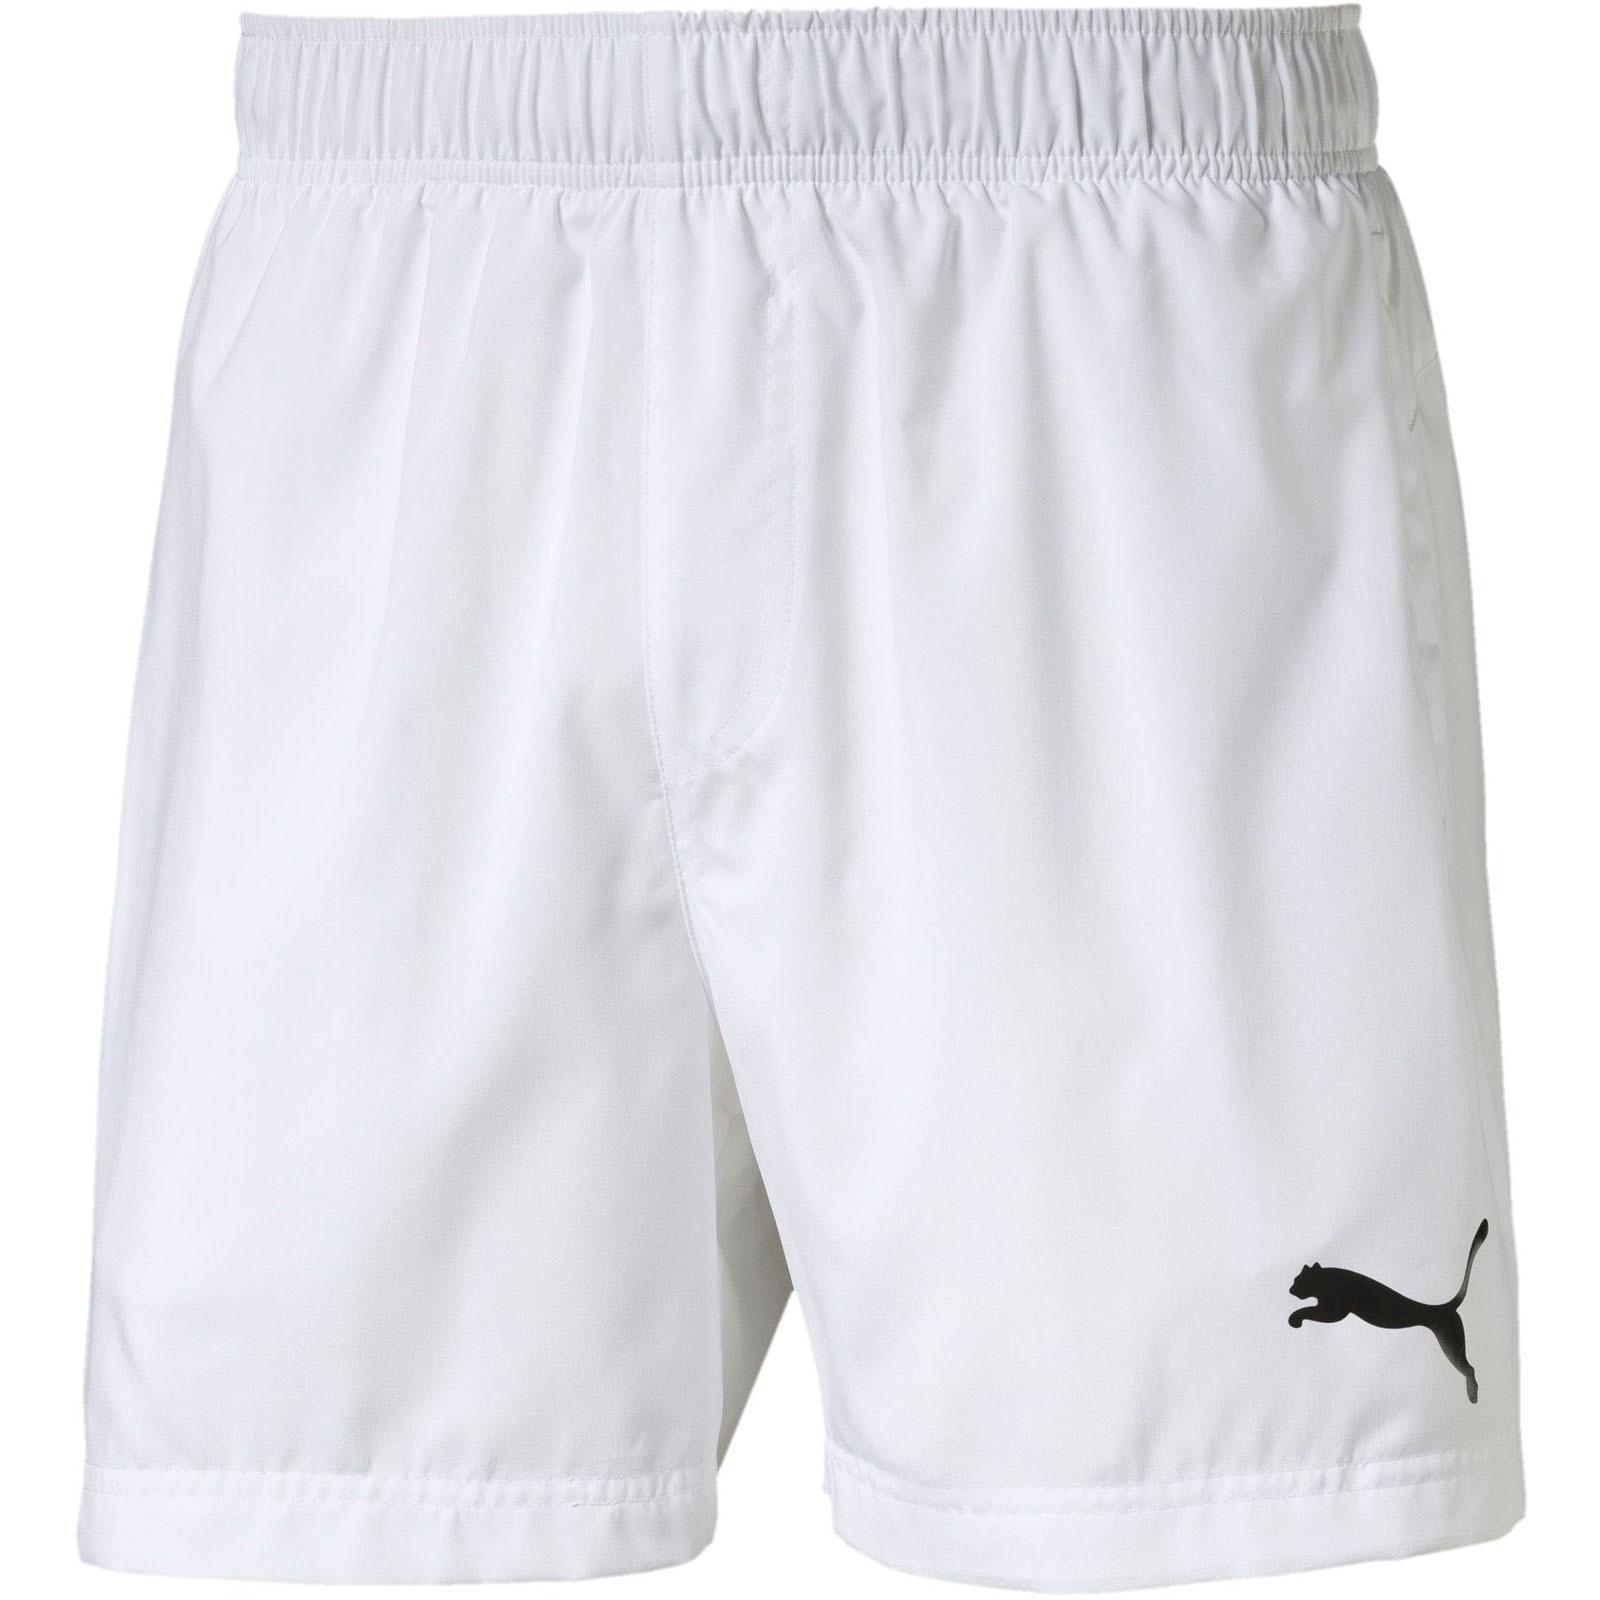 Shorts PUMA 83827102 sports and entertainment for men fbf005 female sports shorts